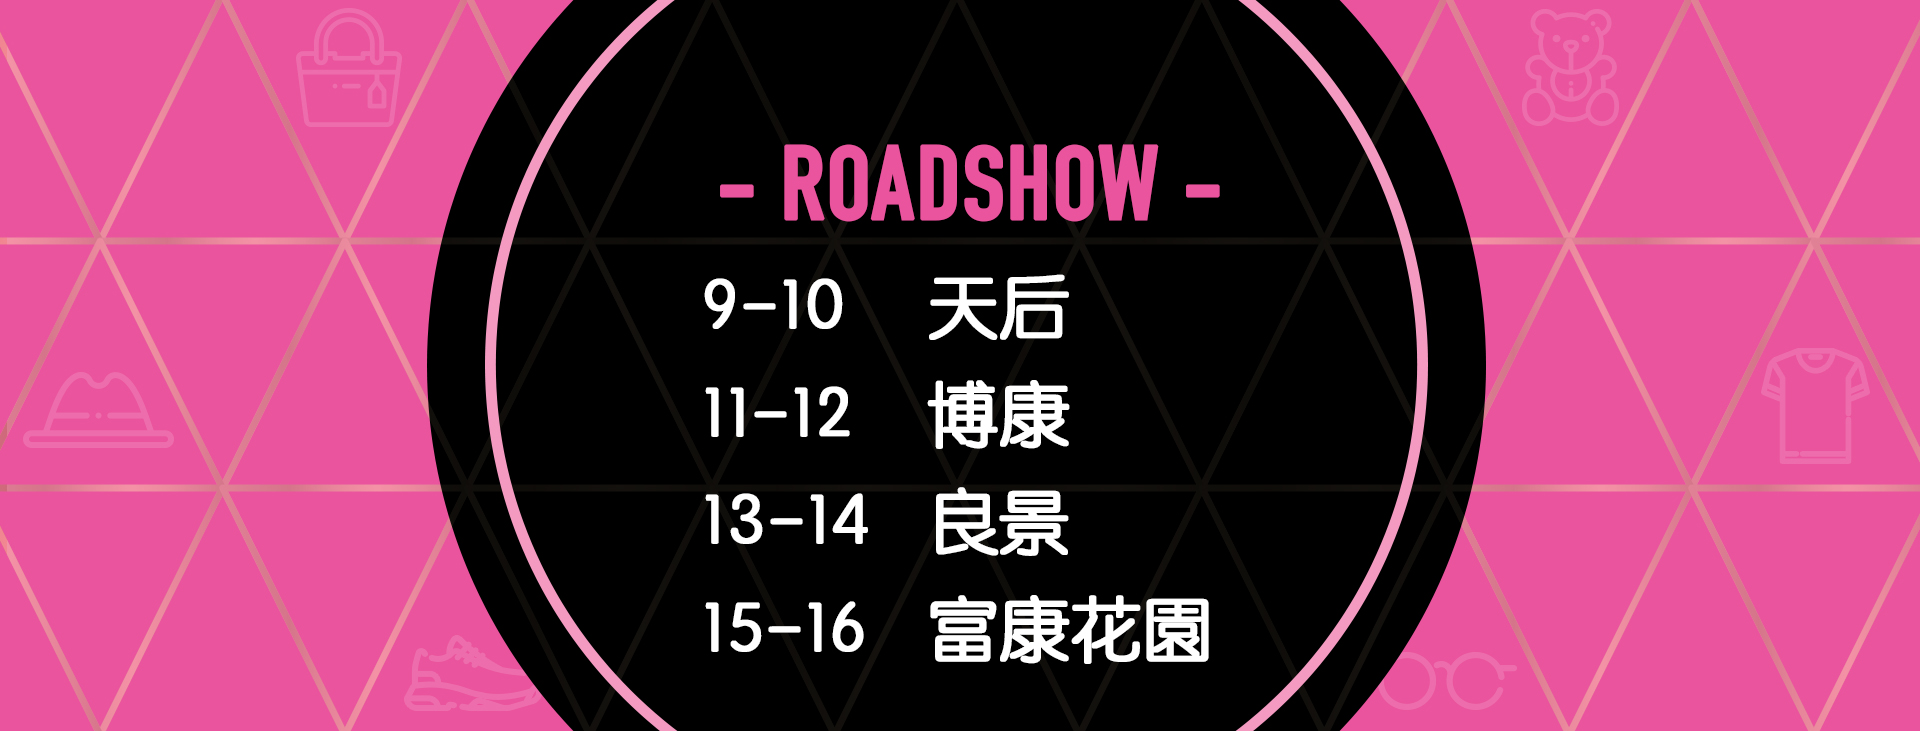 Atomland Roadshow 09-16